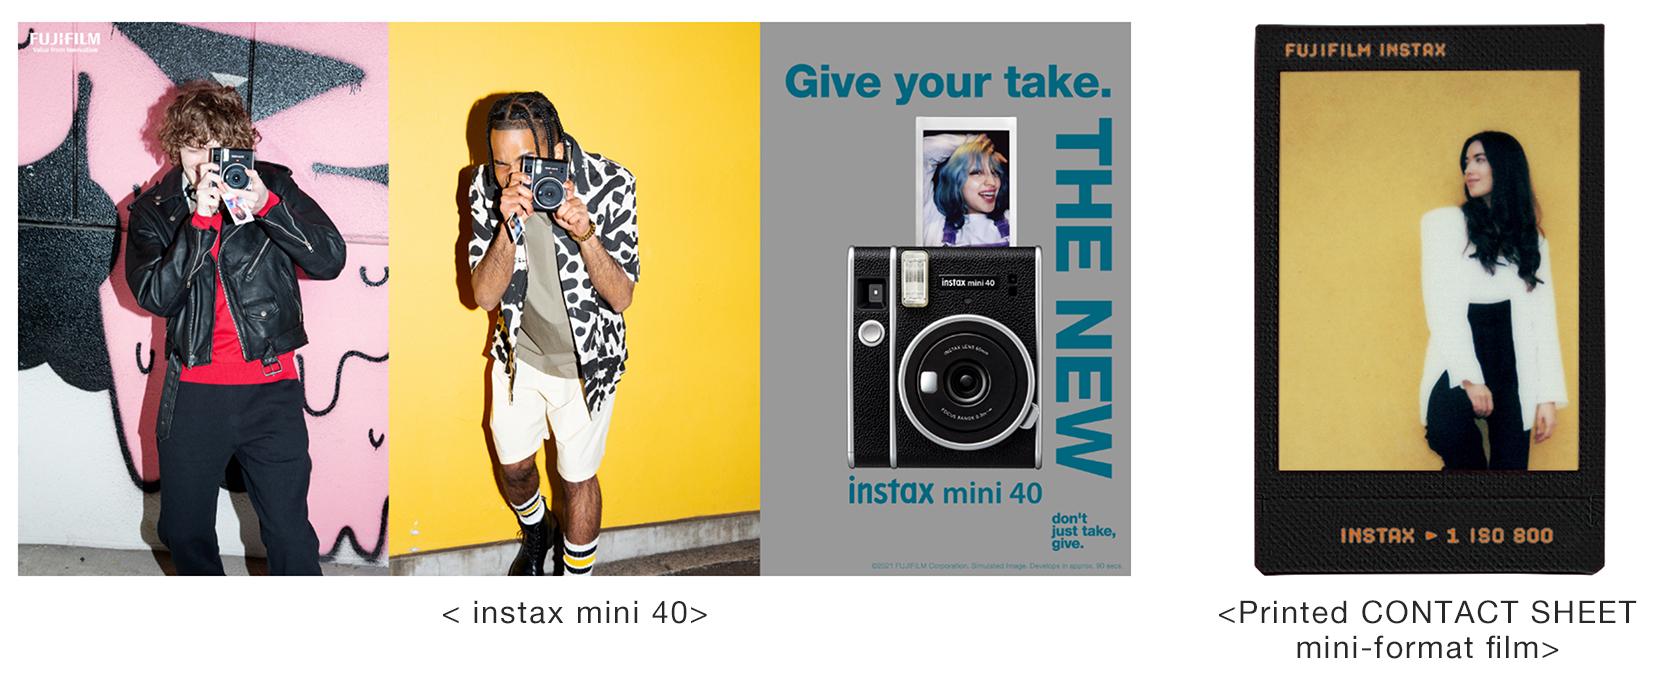 [Image]instax mini 40 / Printed CONTACT SHEET mini-format film